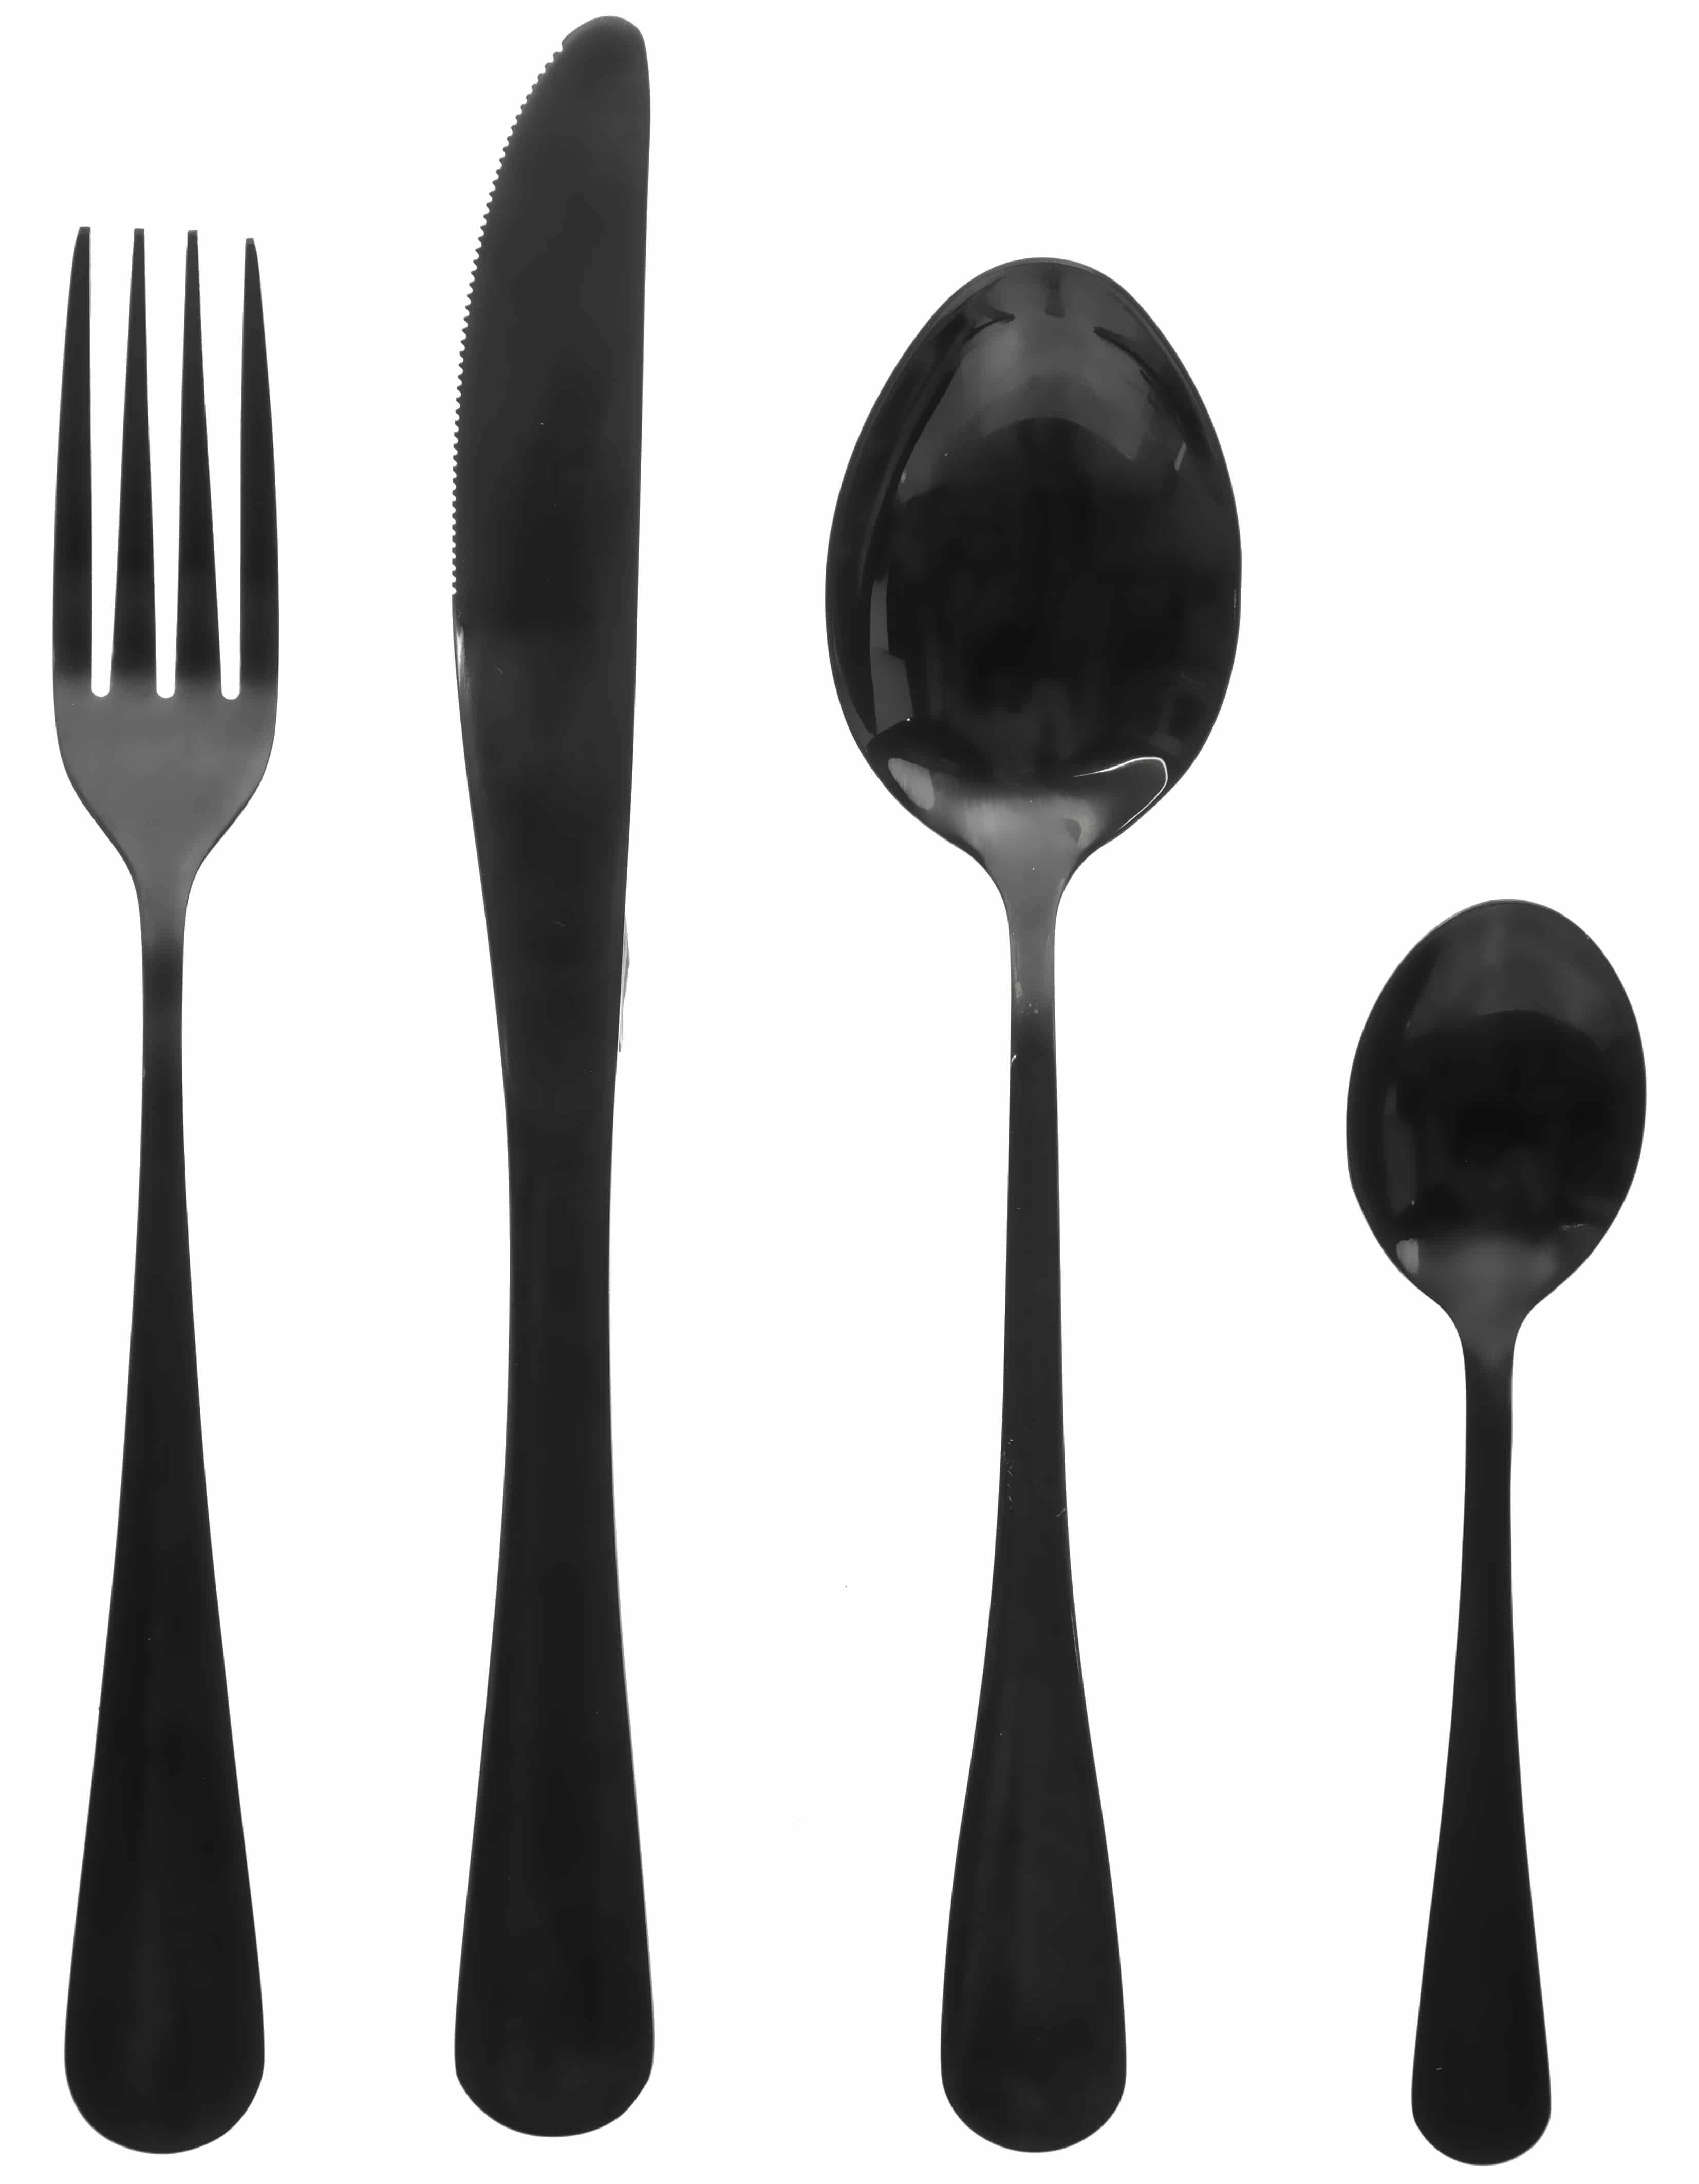 4goodz Bestekset 16-delig Zwart RVS Black Shadow 4 persoons - zwart